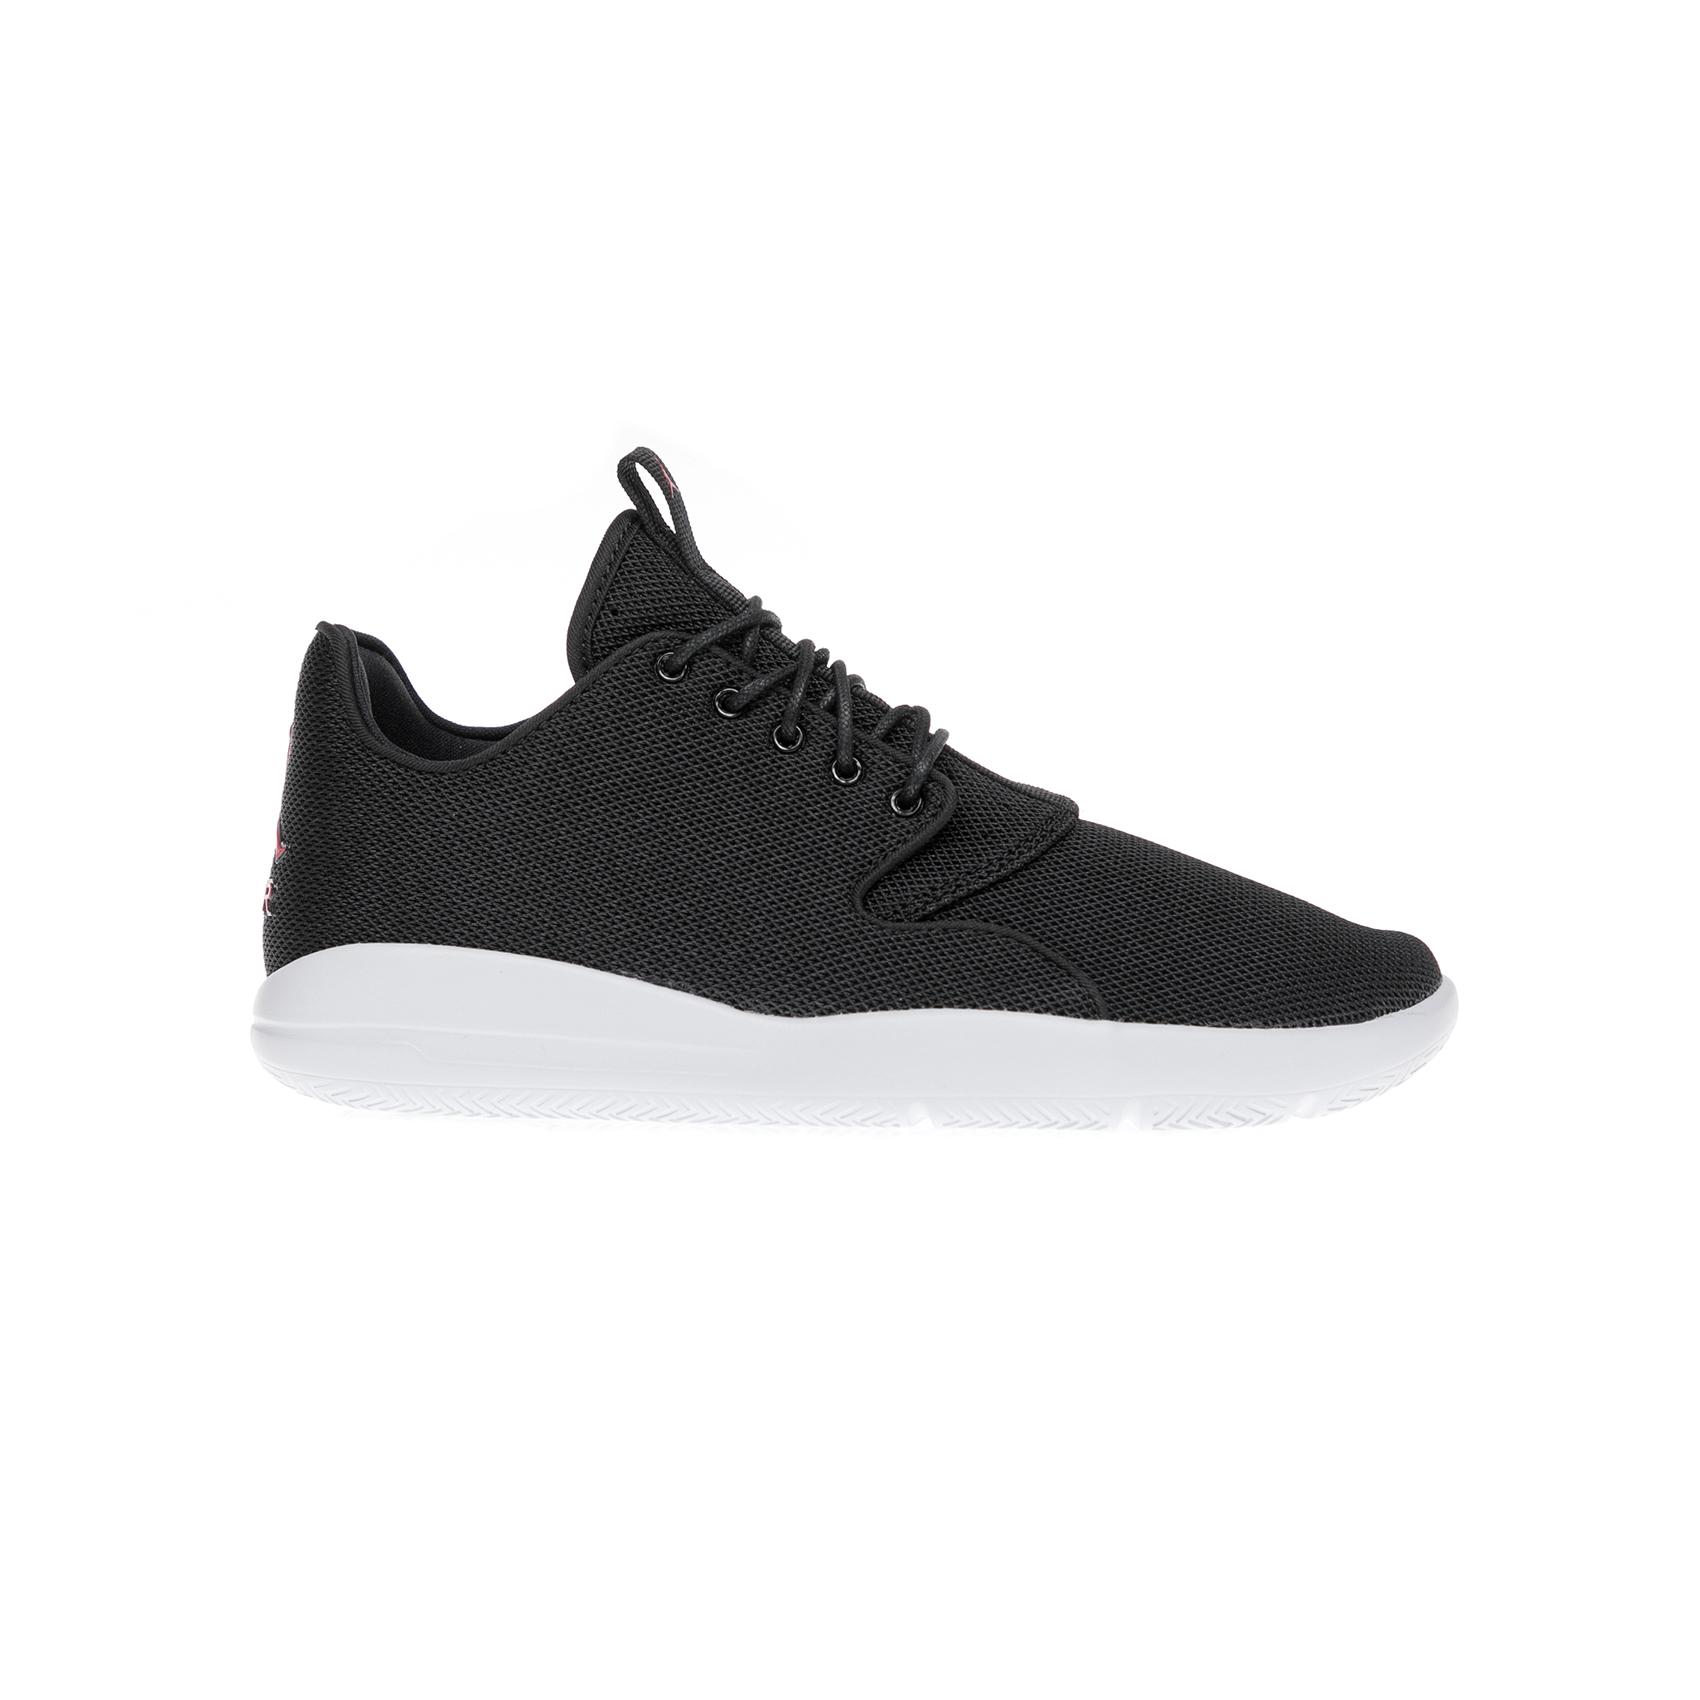 NIKE - Αντρικά παπούτσια NIKE JORDAN ECLIPSE μαύρα ανδρικά παπούτσια αθλητικά basketball